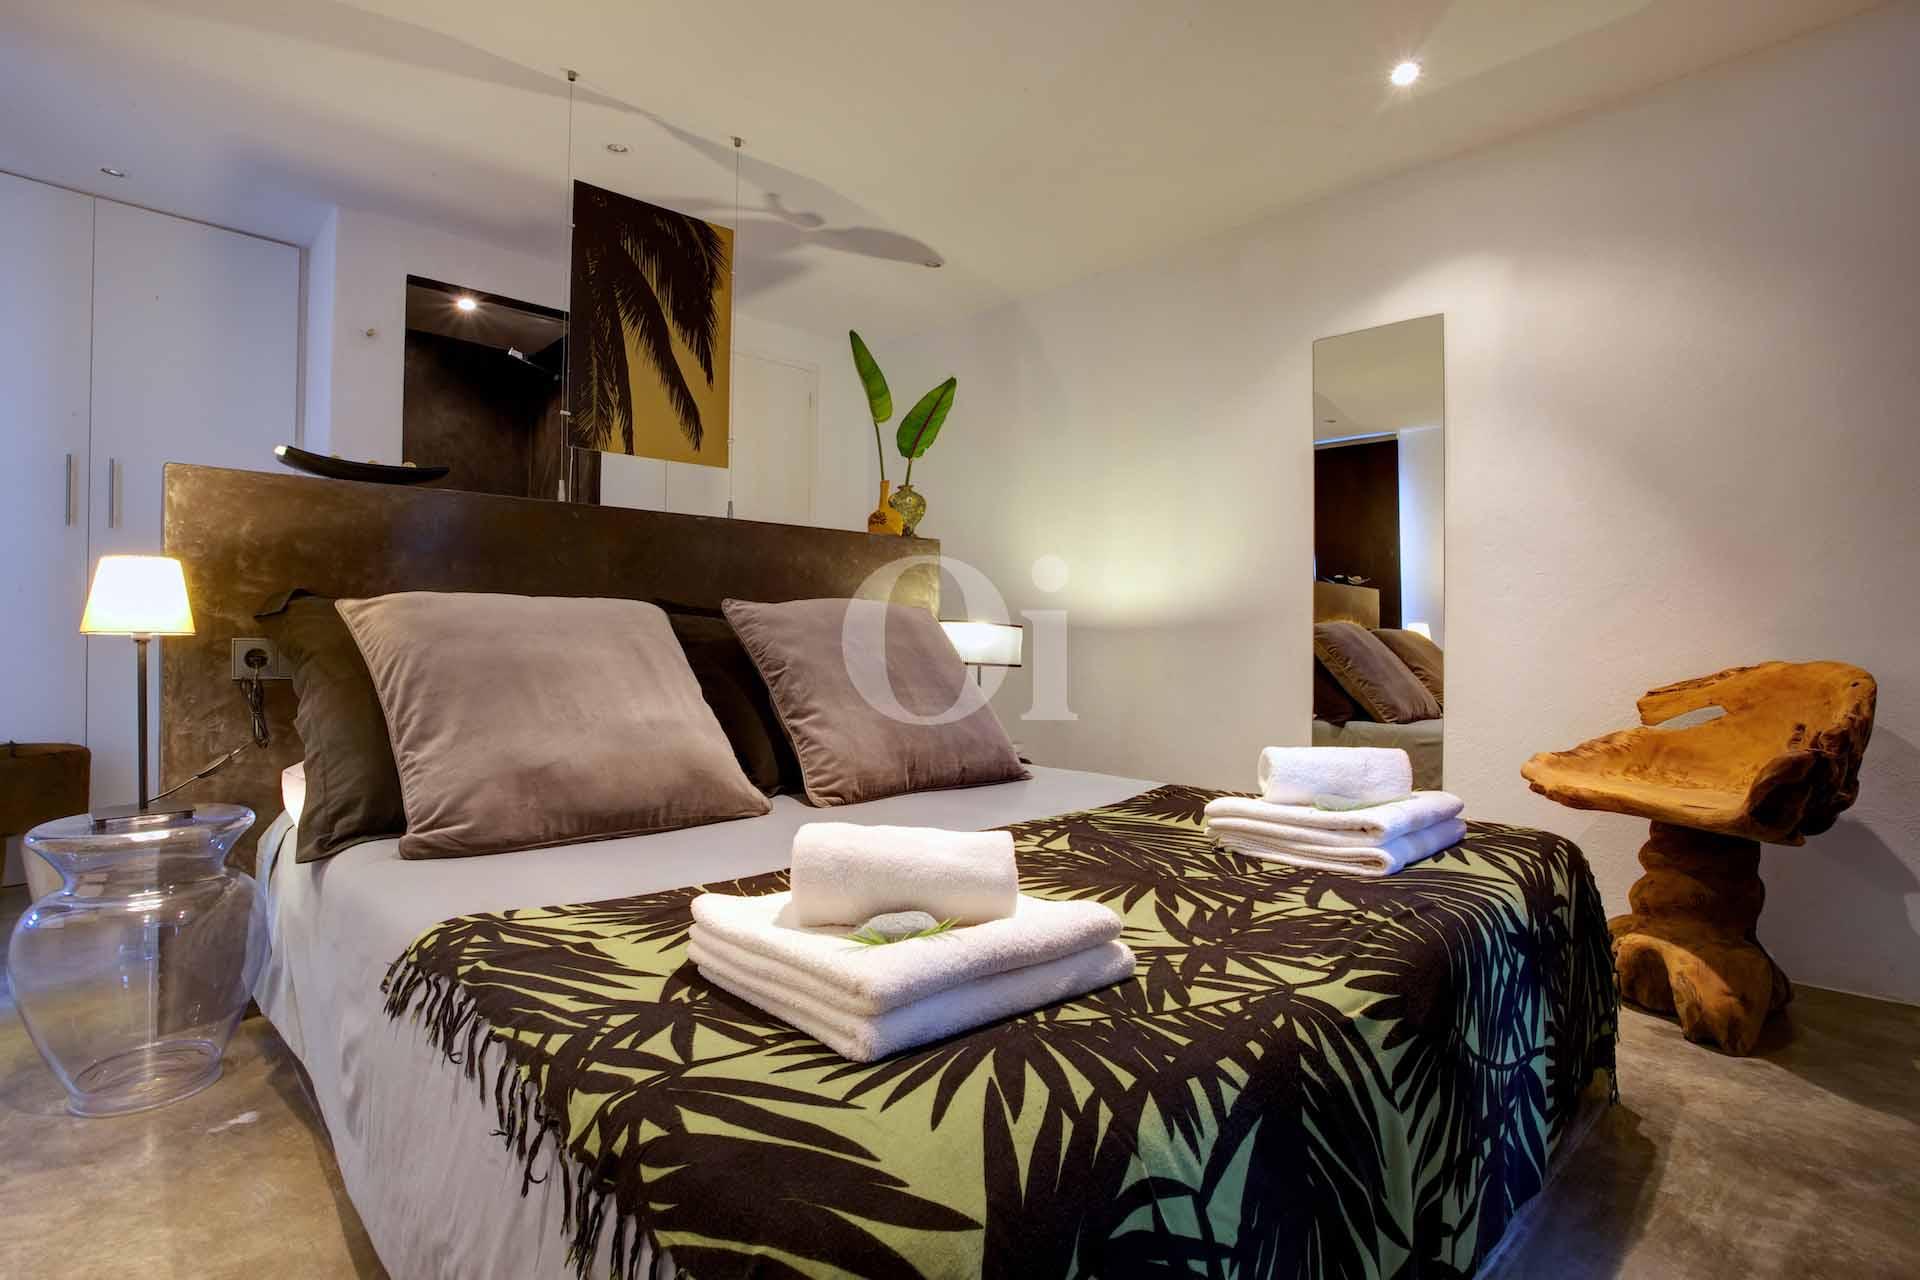 Dormitorio amplio bien iluminado